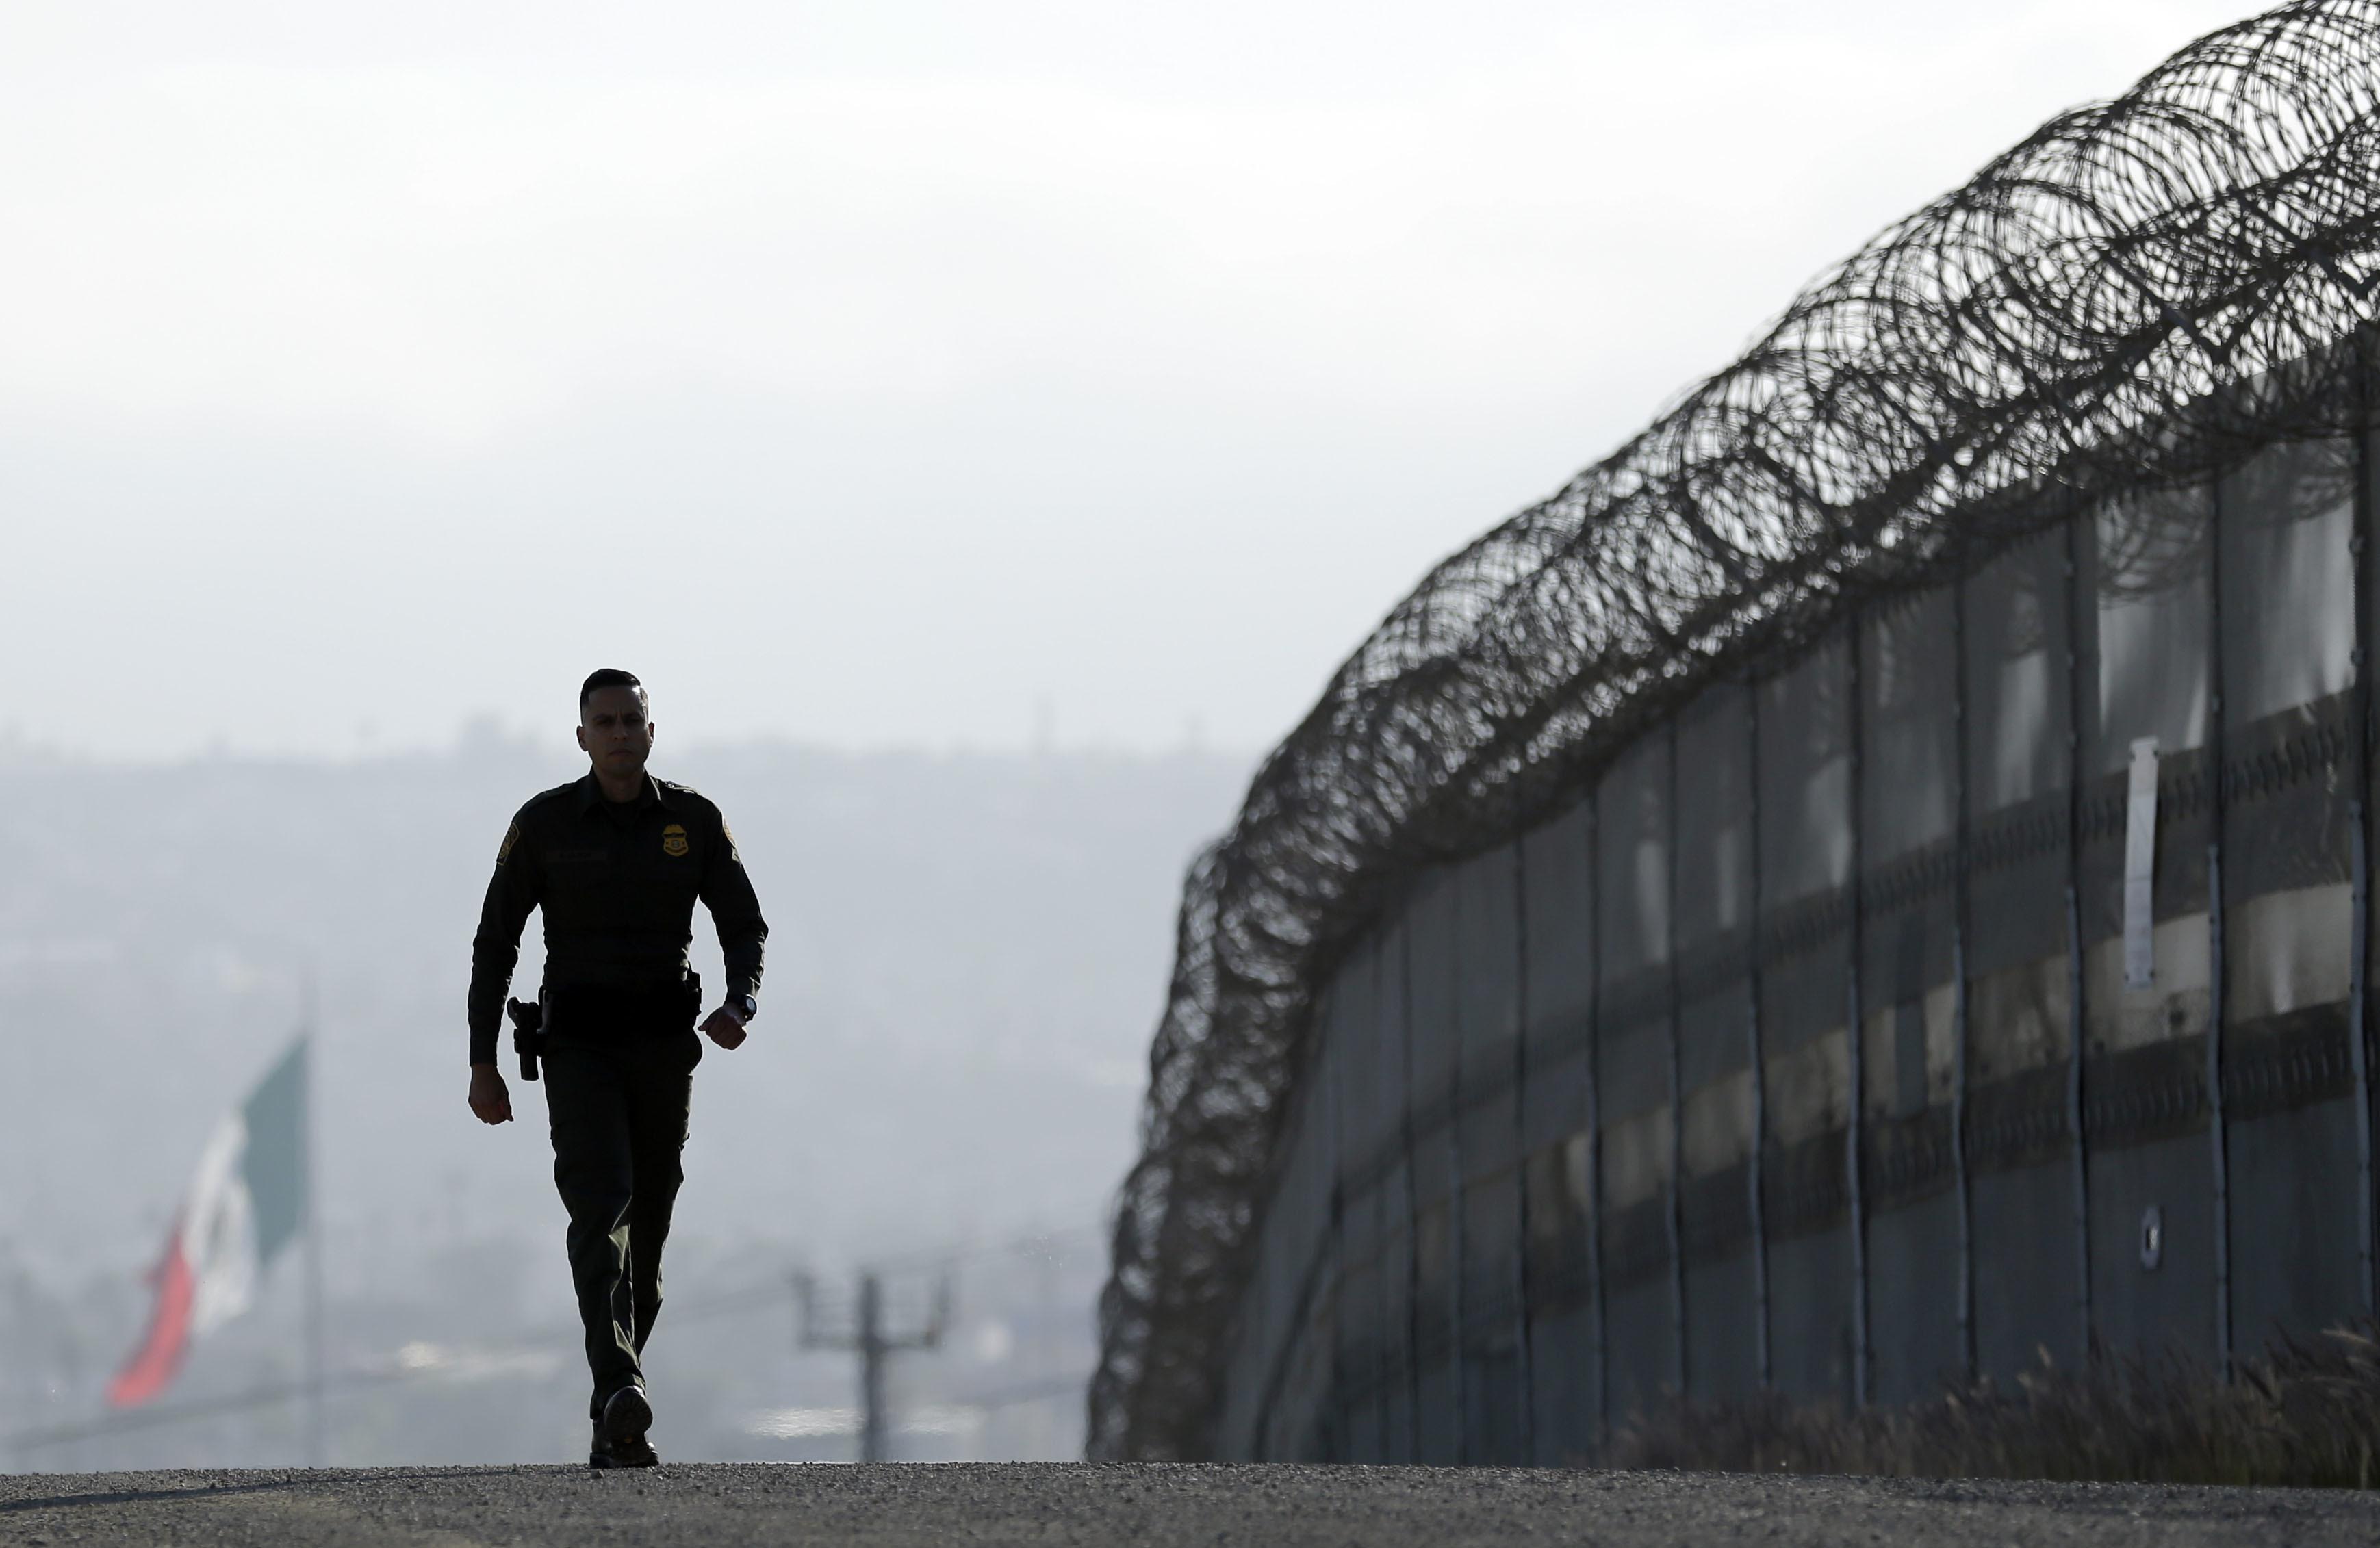 Court halts Trump's emergency declaration wall-building plans